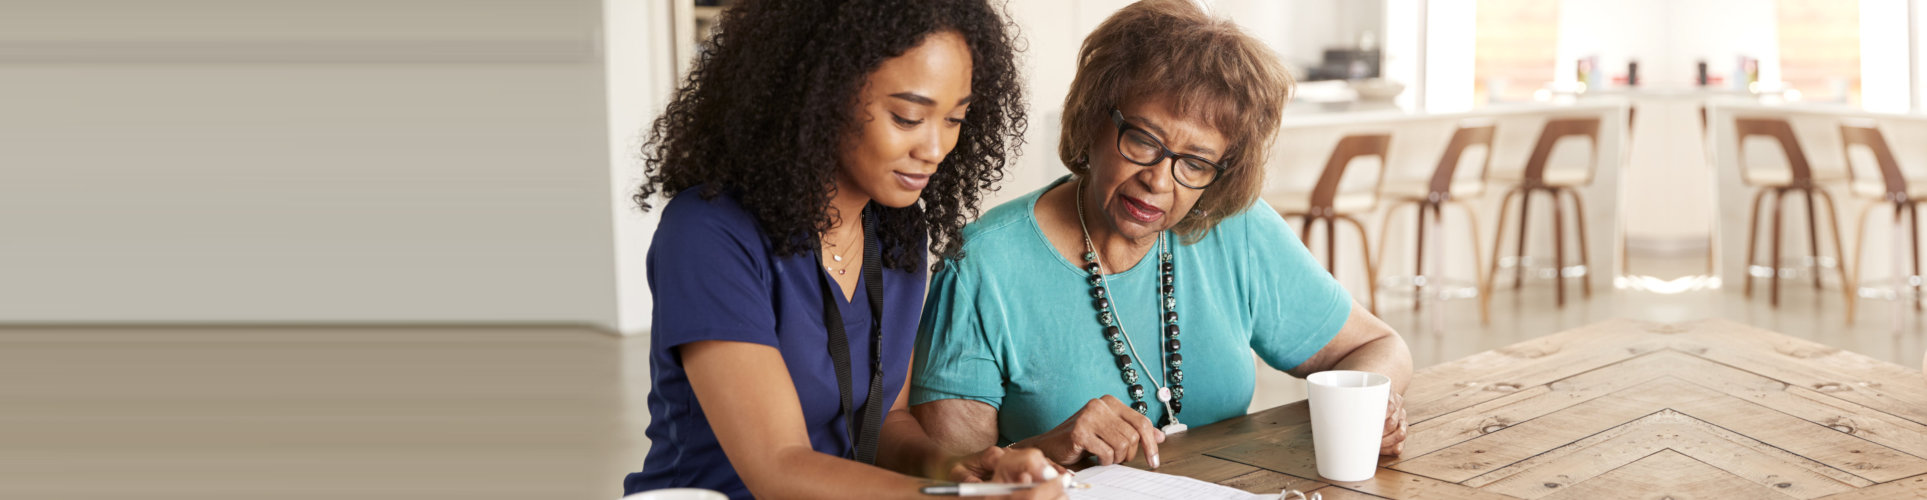 caregiver helping the elder woman